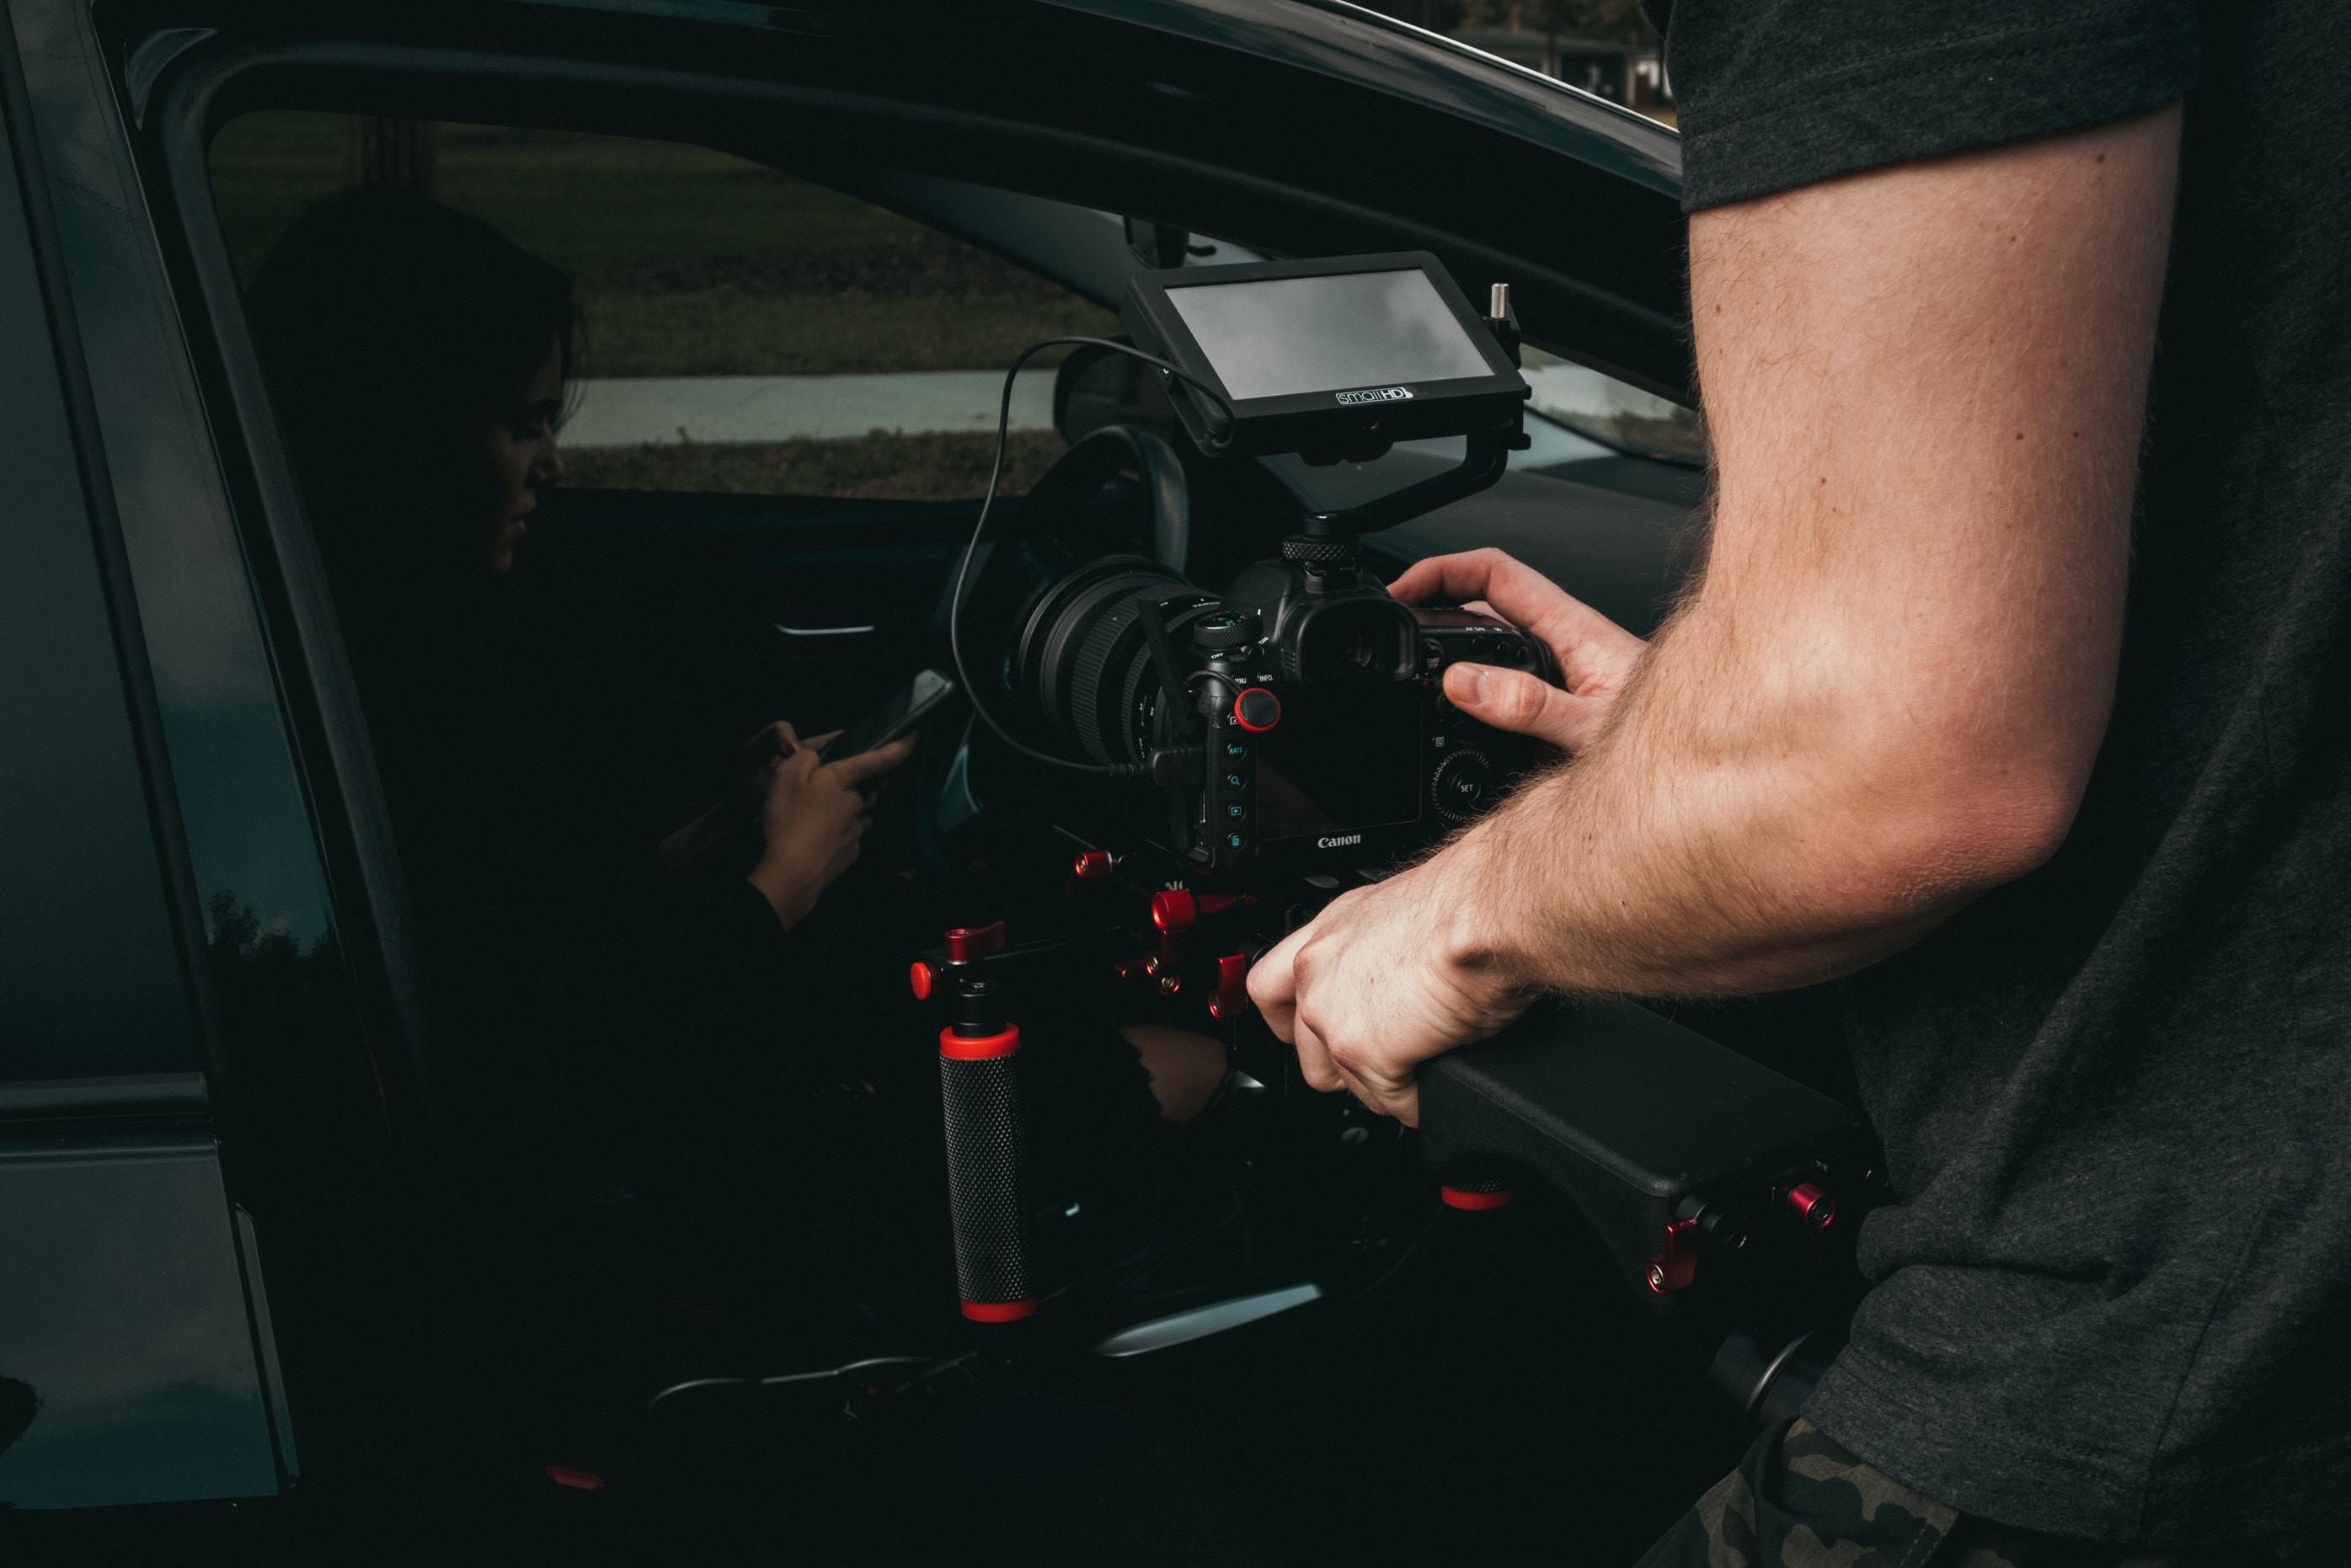 man taking video of woman inside vehicle